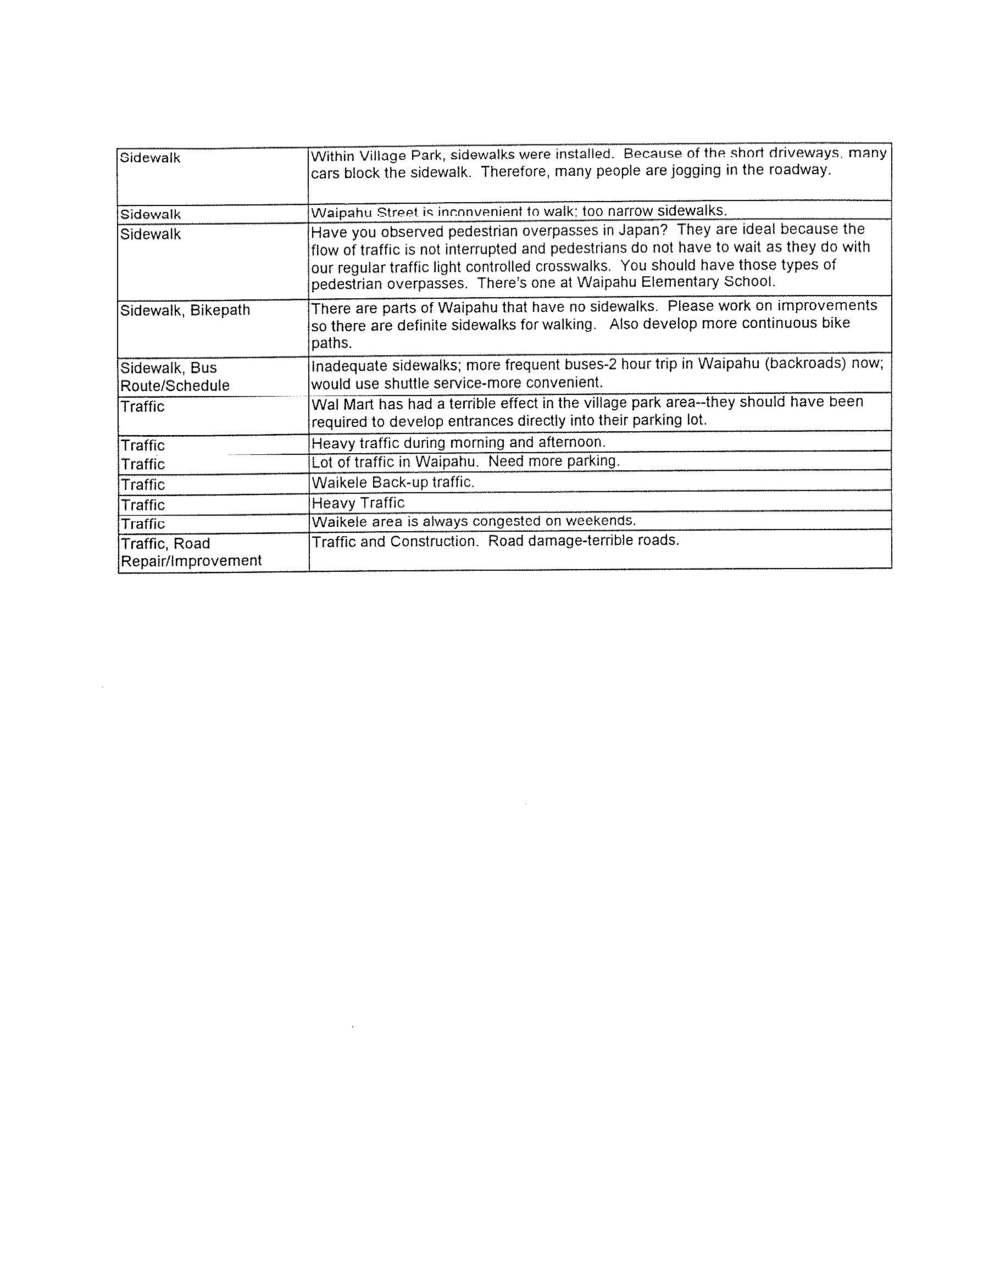 160531_WaipahuLivableCommunities(1998)_Page_166.jpg